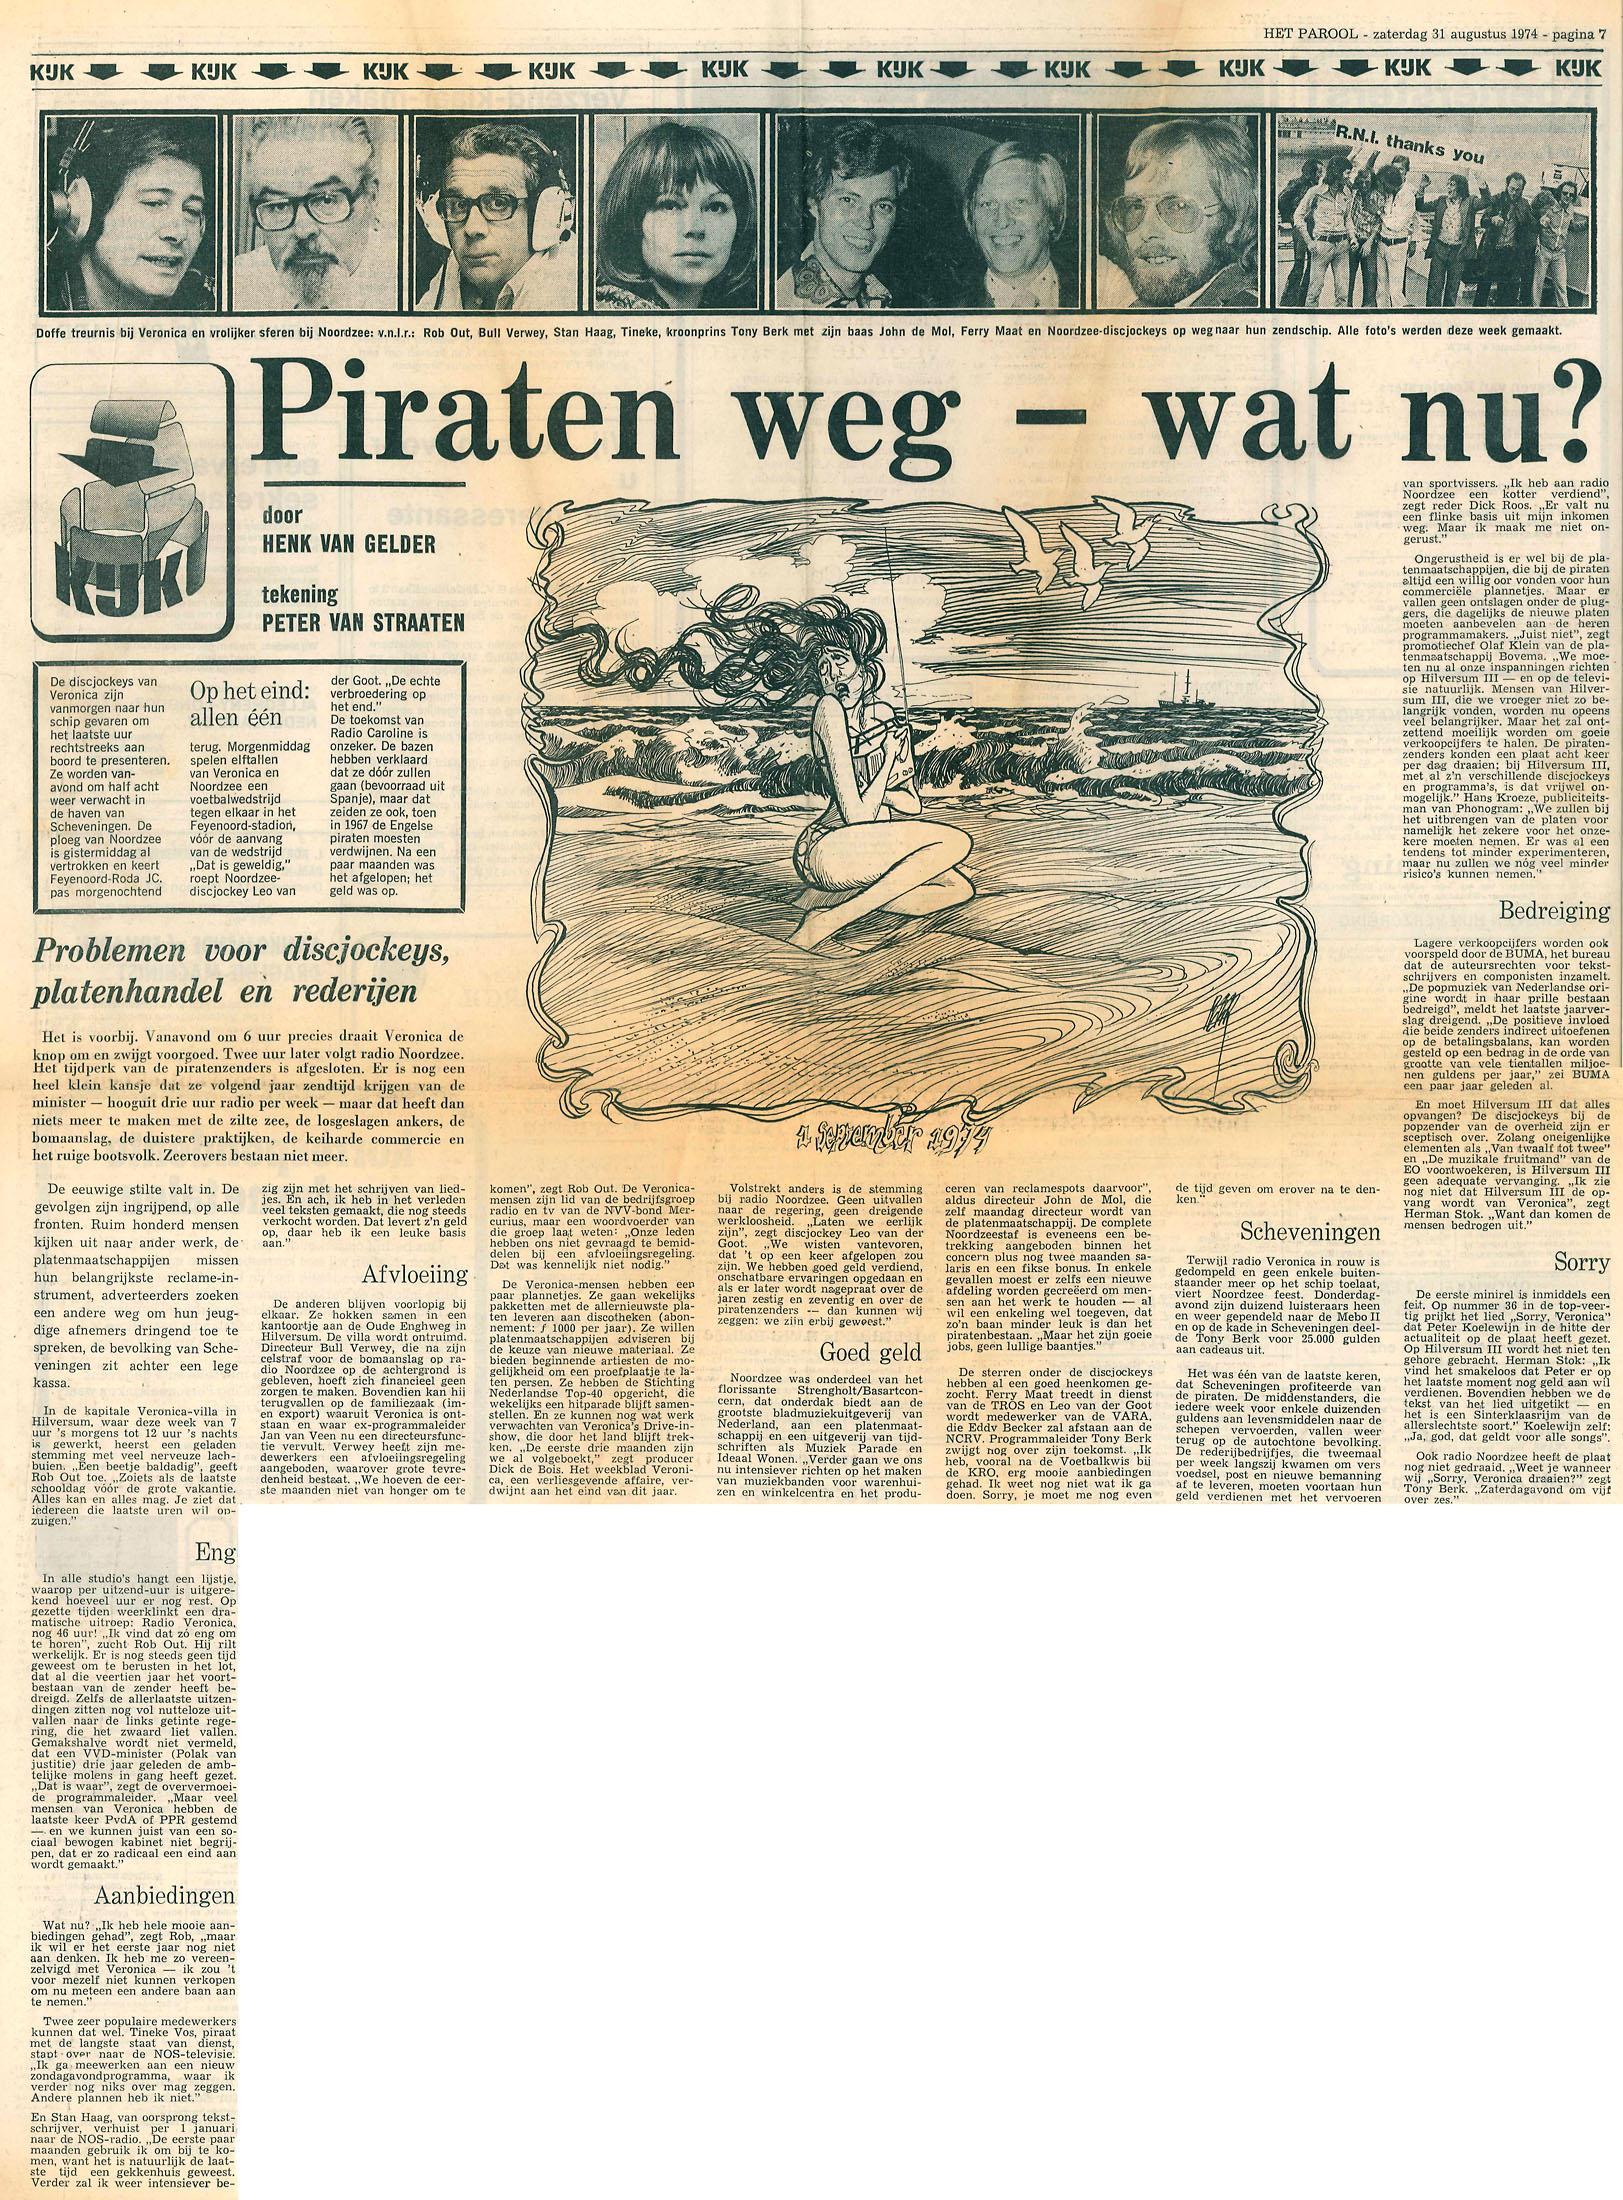 19740931_Parool_Piraten_weg_wat_nu_Ver_RNI.jpg